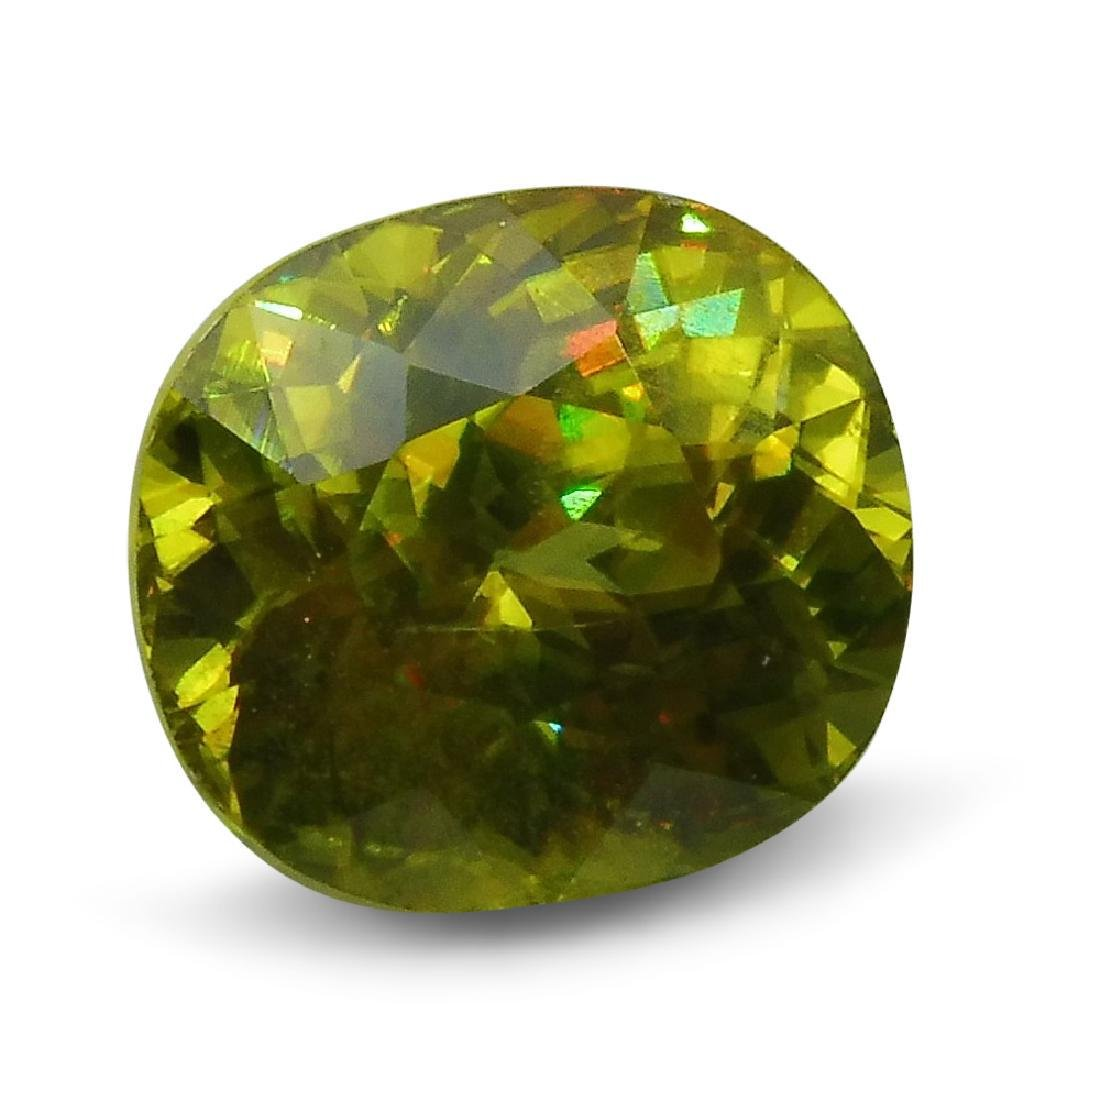 2.94 ct GIA Certified Sphene (Titanite) - 4